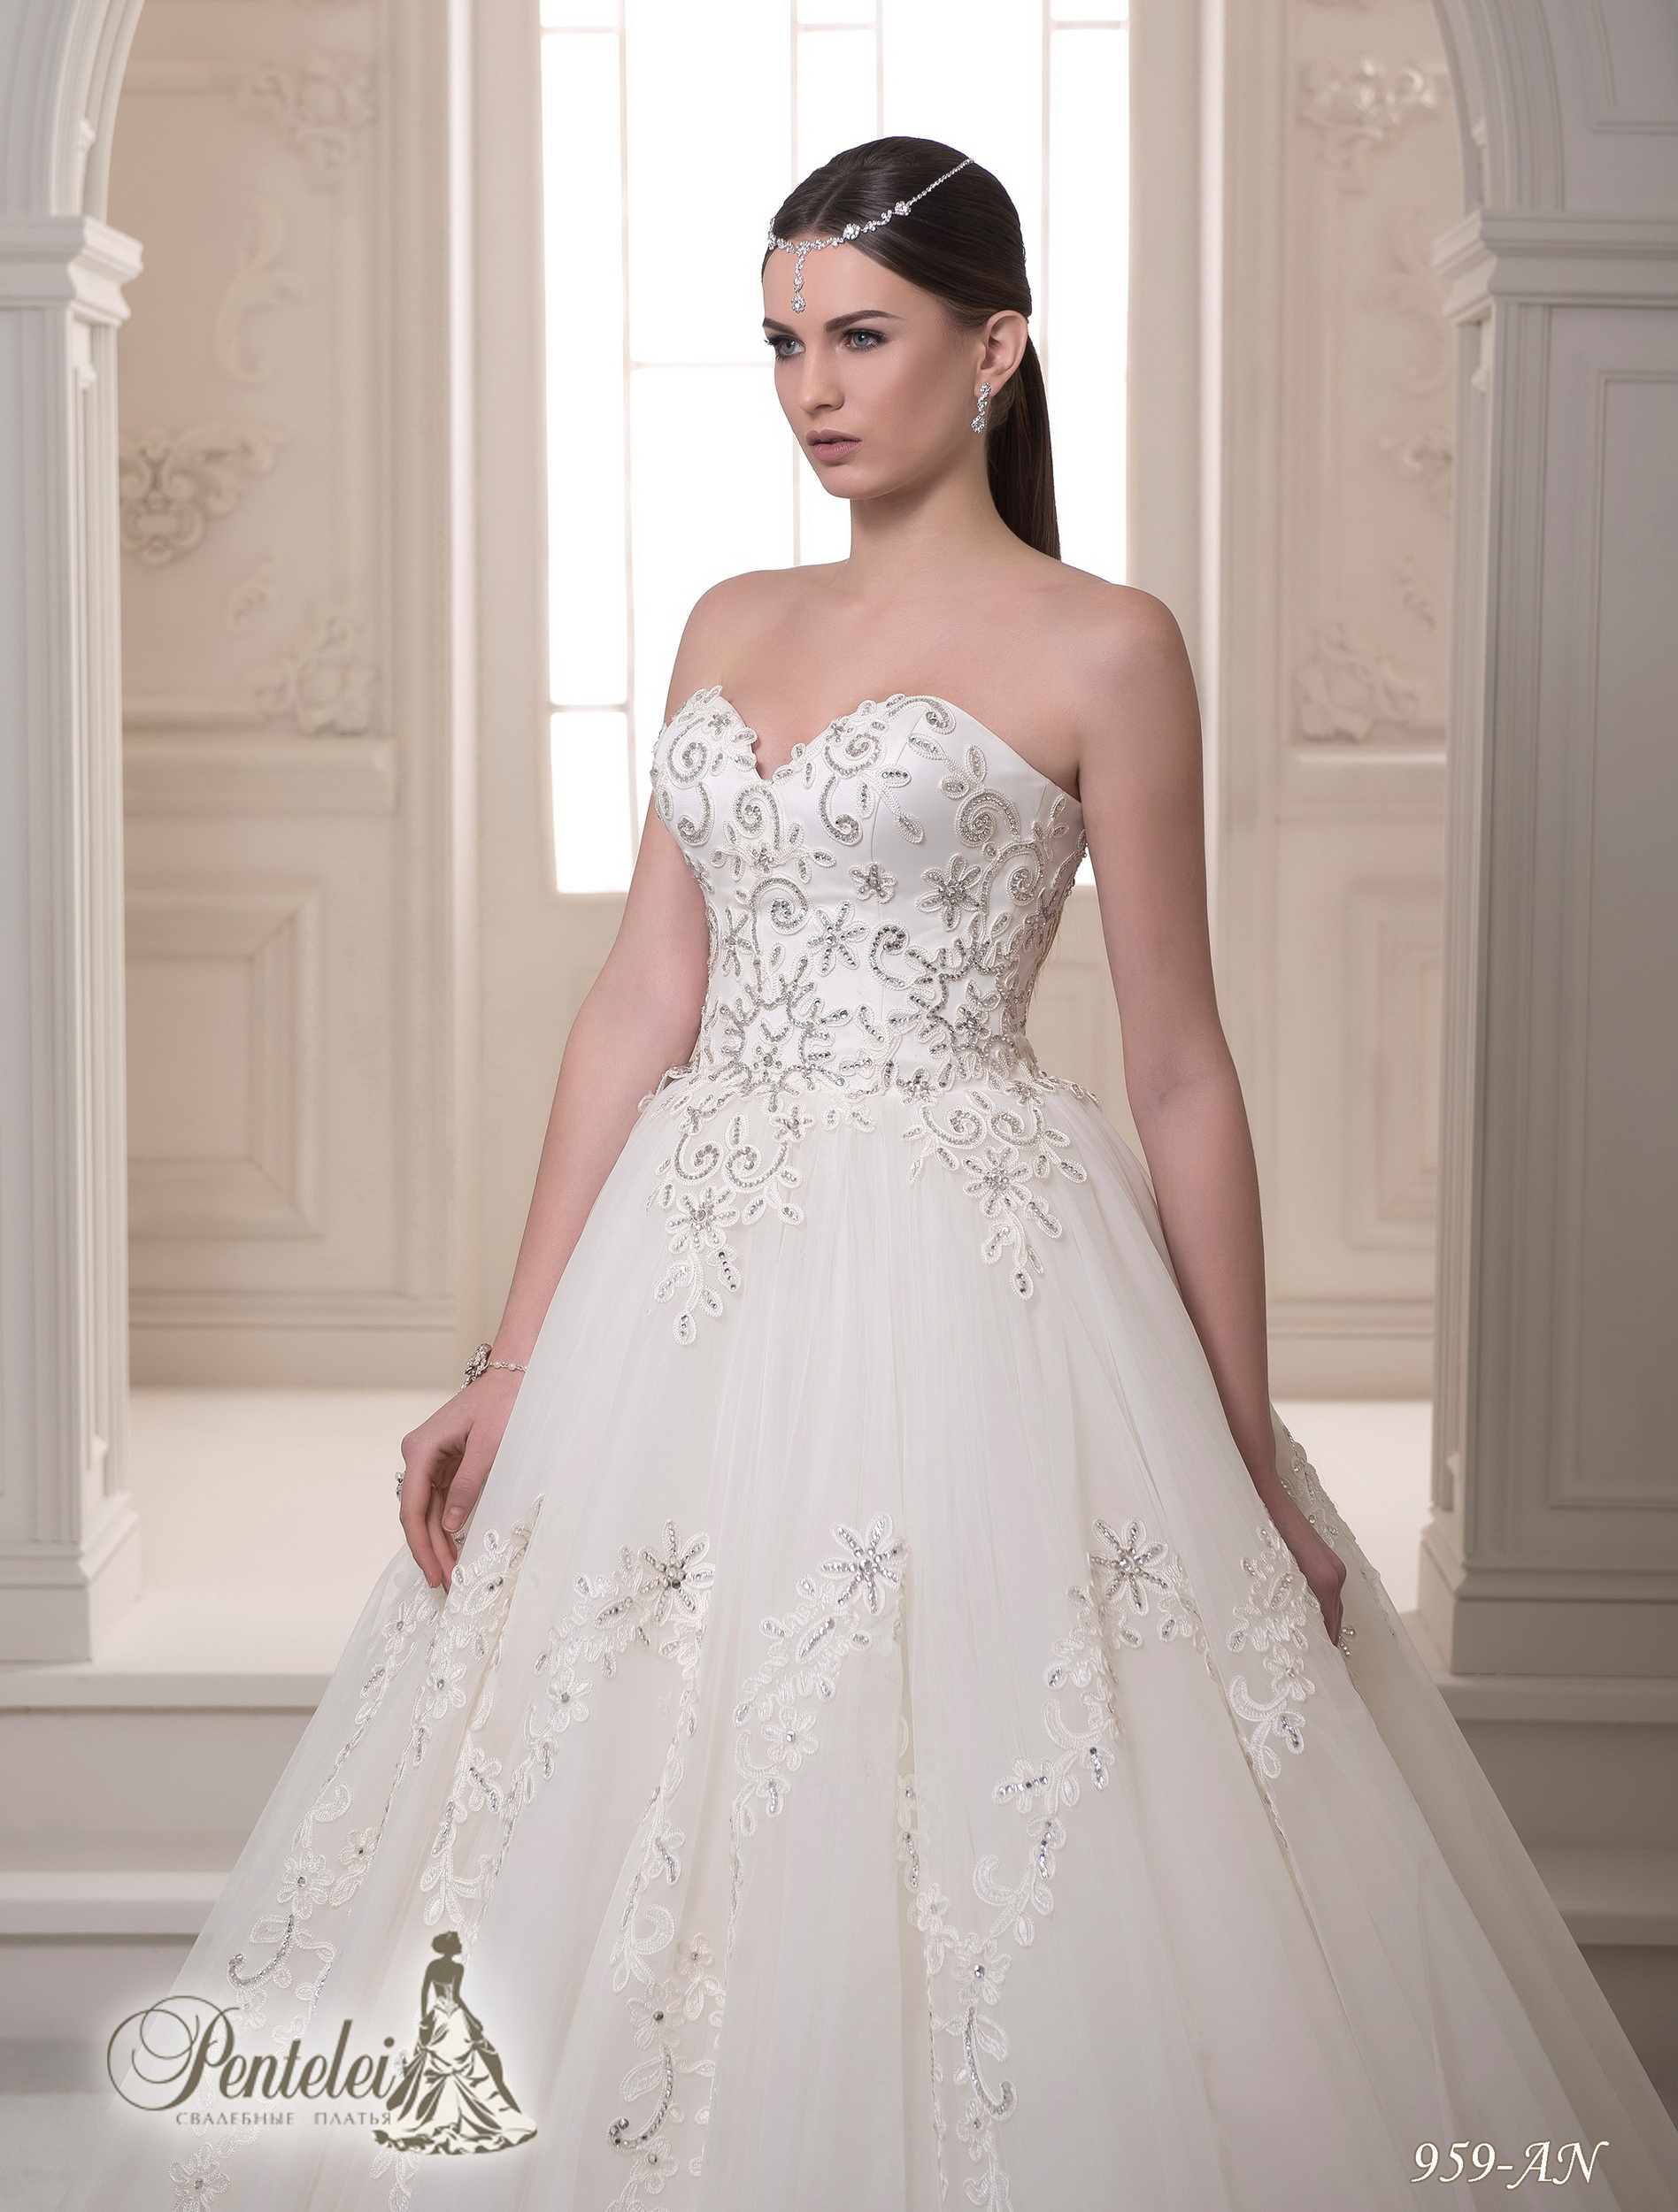 959-AN | Cumpăra rochii de mireasă en-gros de Pentelei